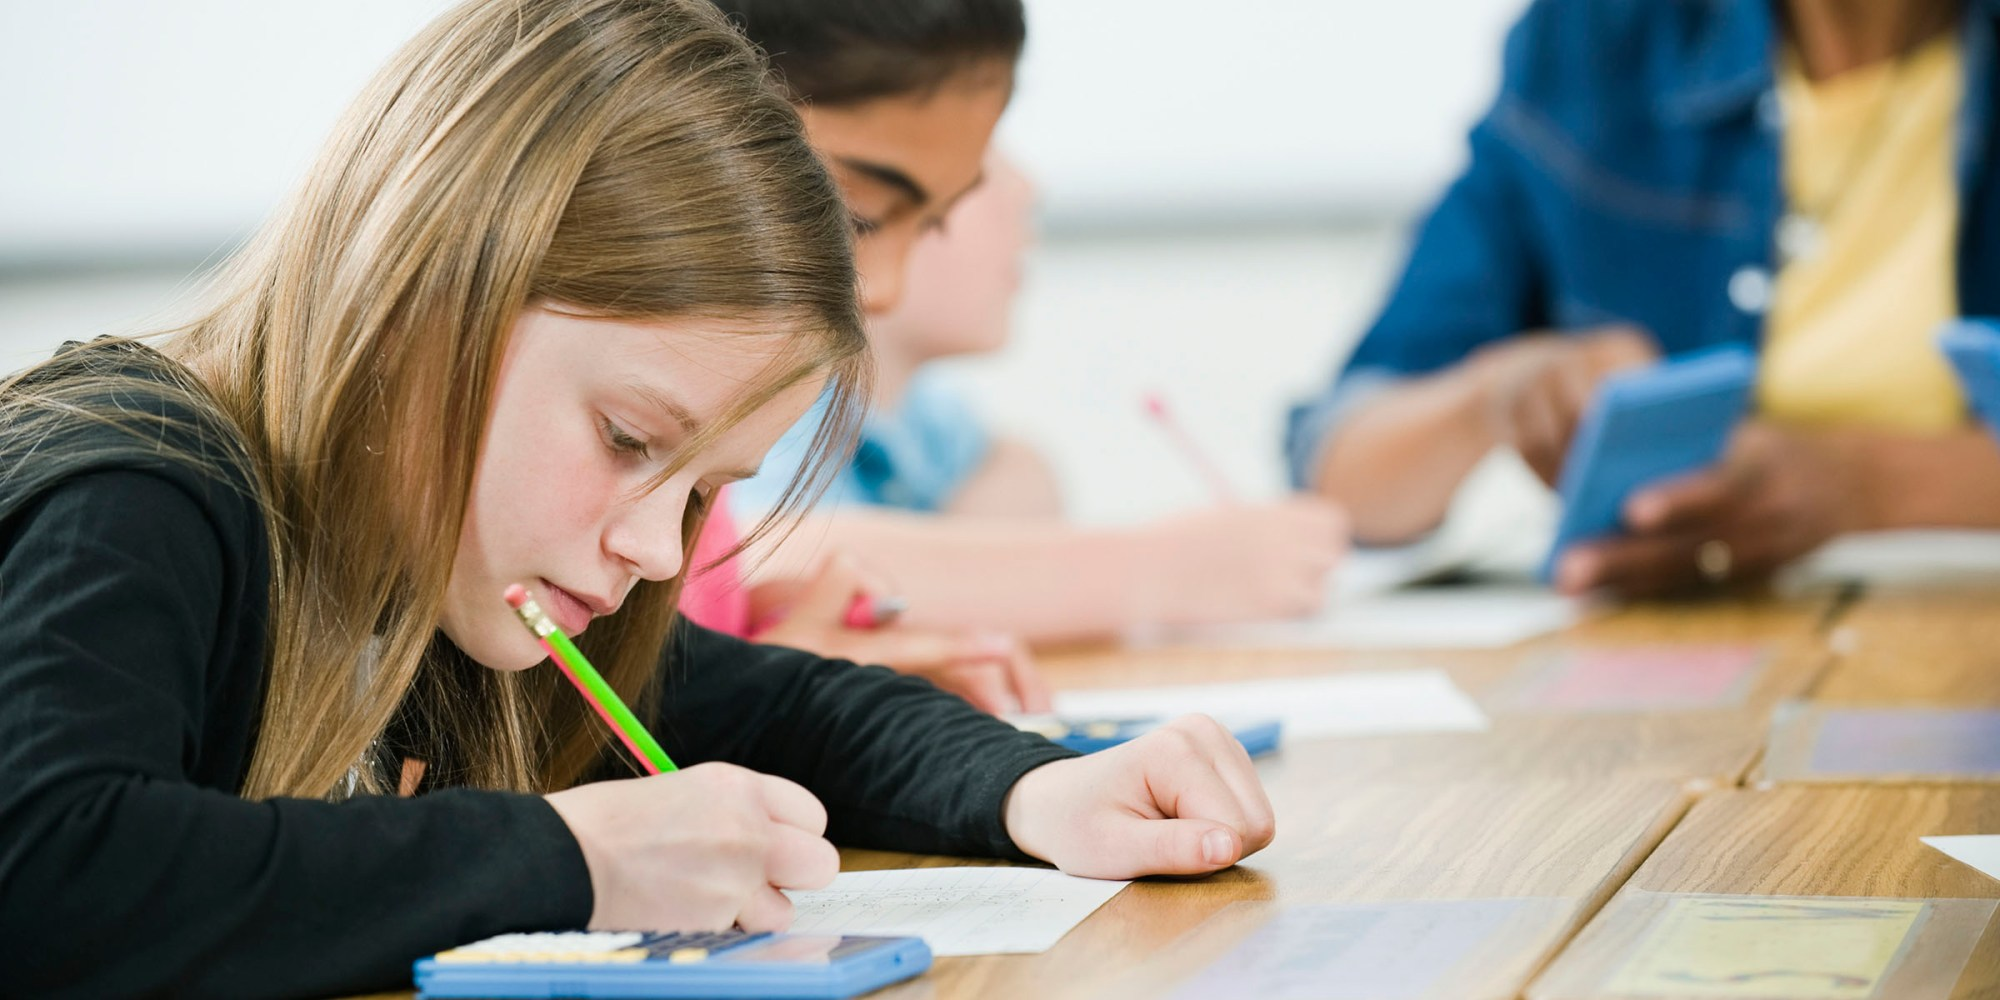 hight resolution of 4th grade math: Important math skills for 4th grade